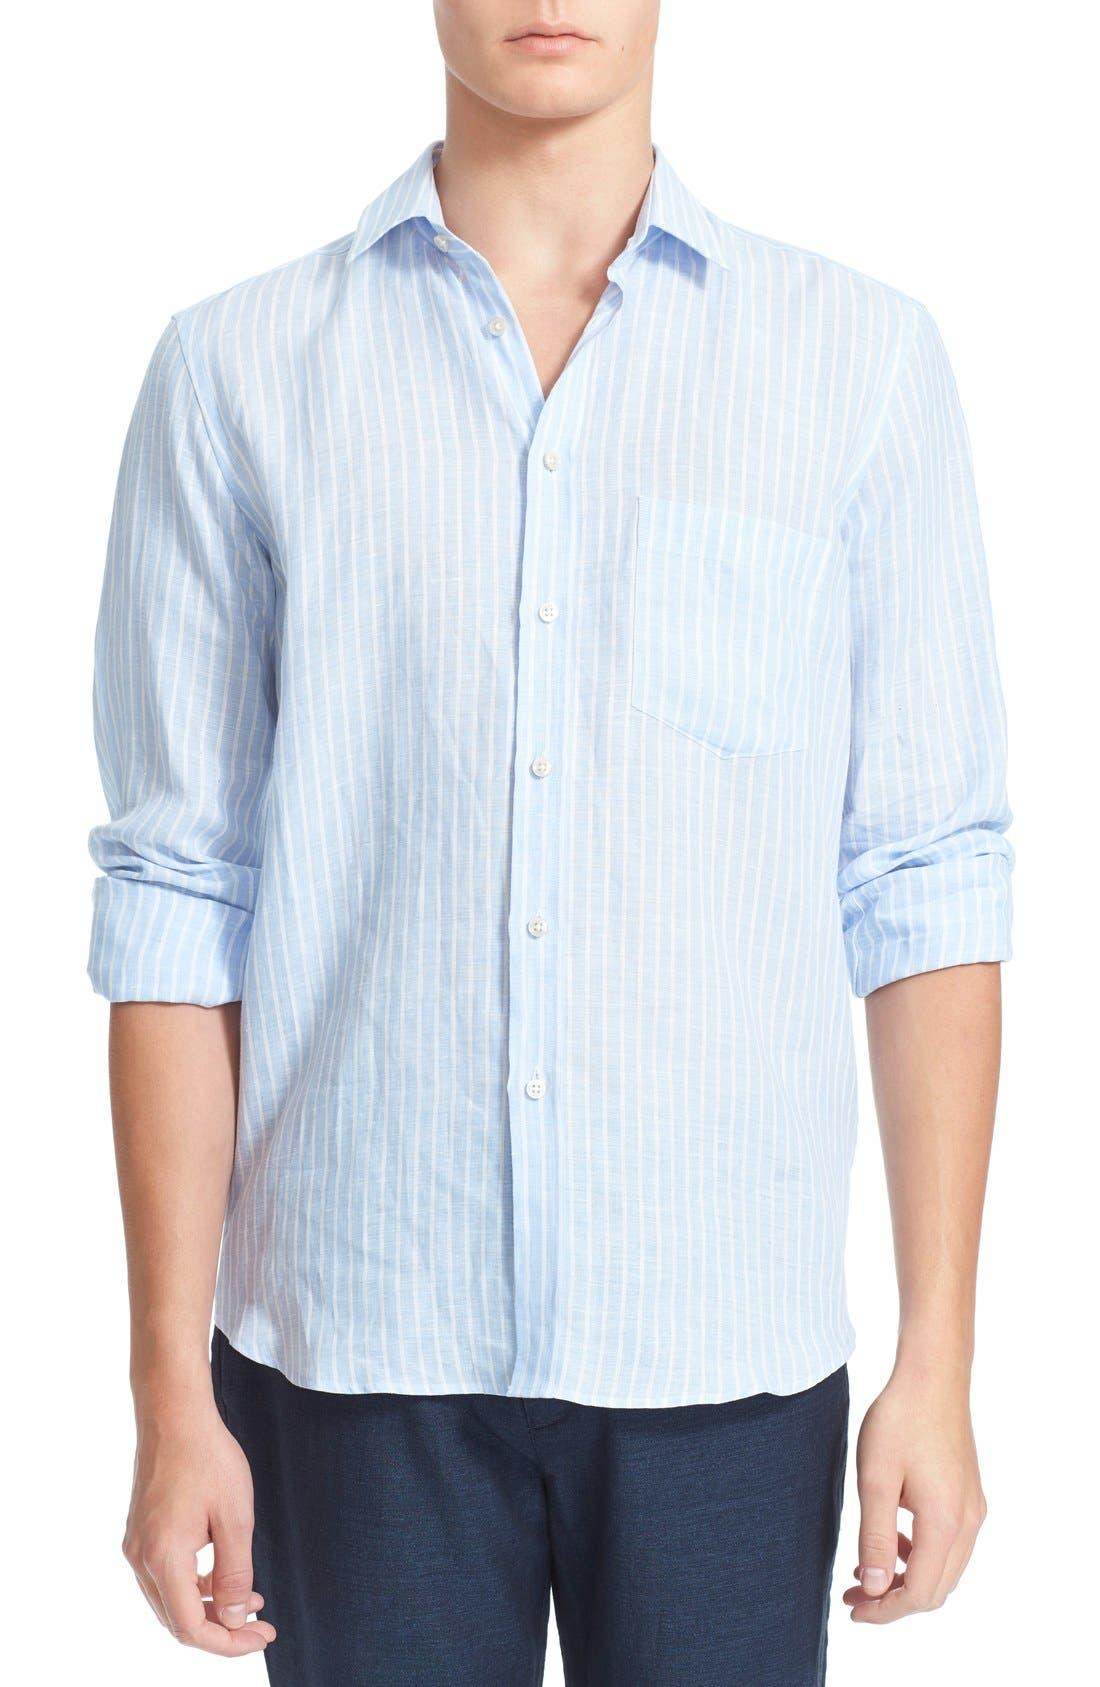 Vilebrequin 'Carrix' Trim Fit Stripe Linen Shirt